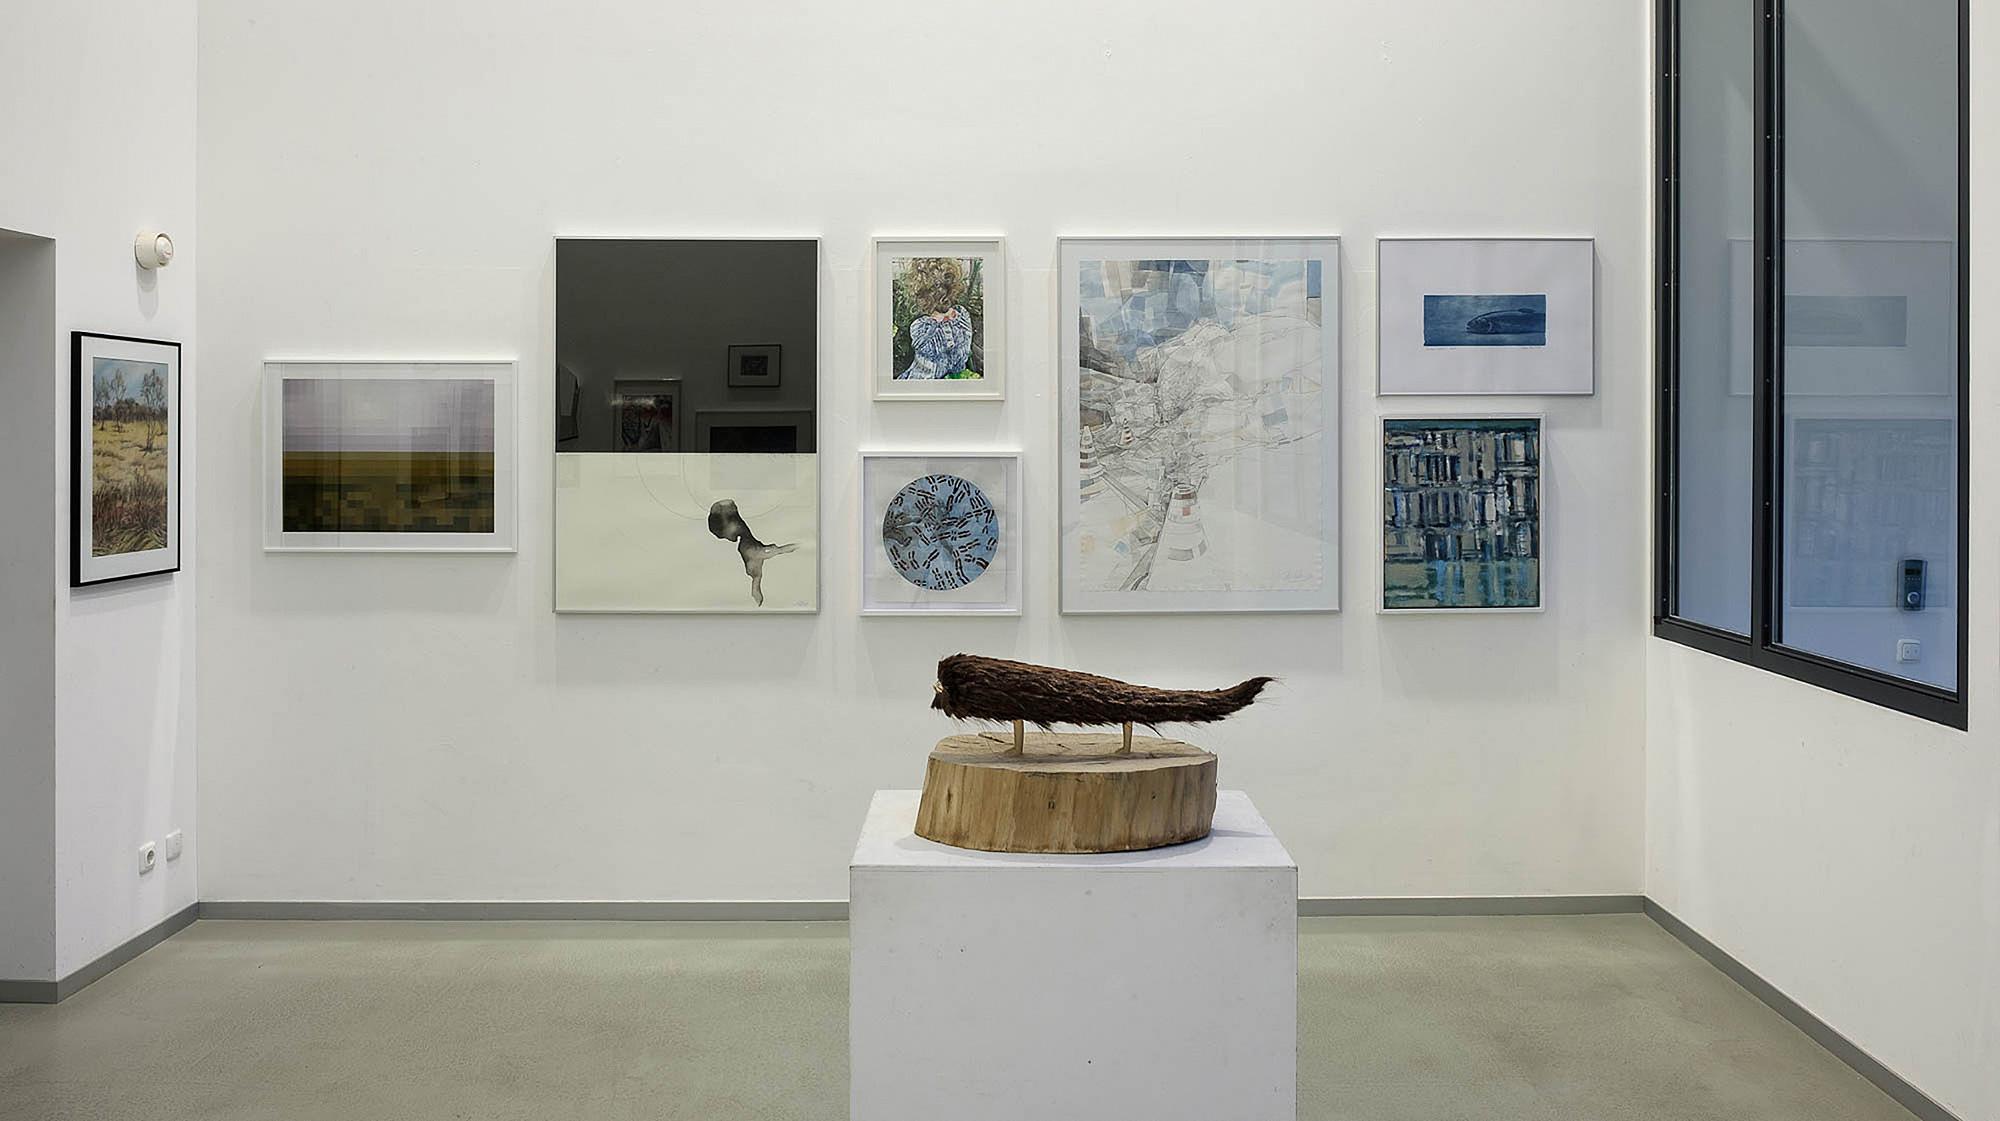 Bärbel Hornung | Jenaer Kunstverein | 2020